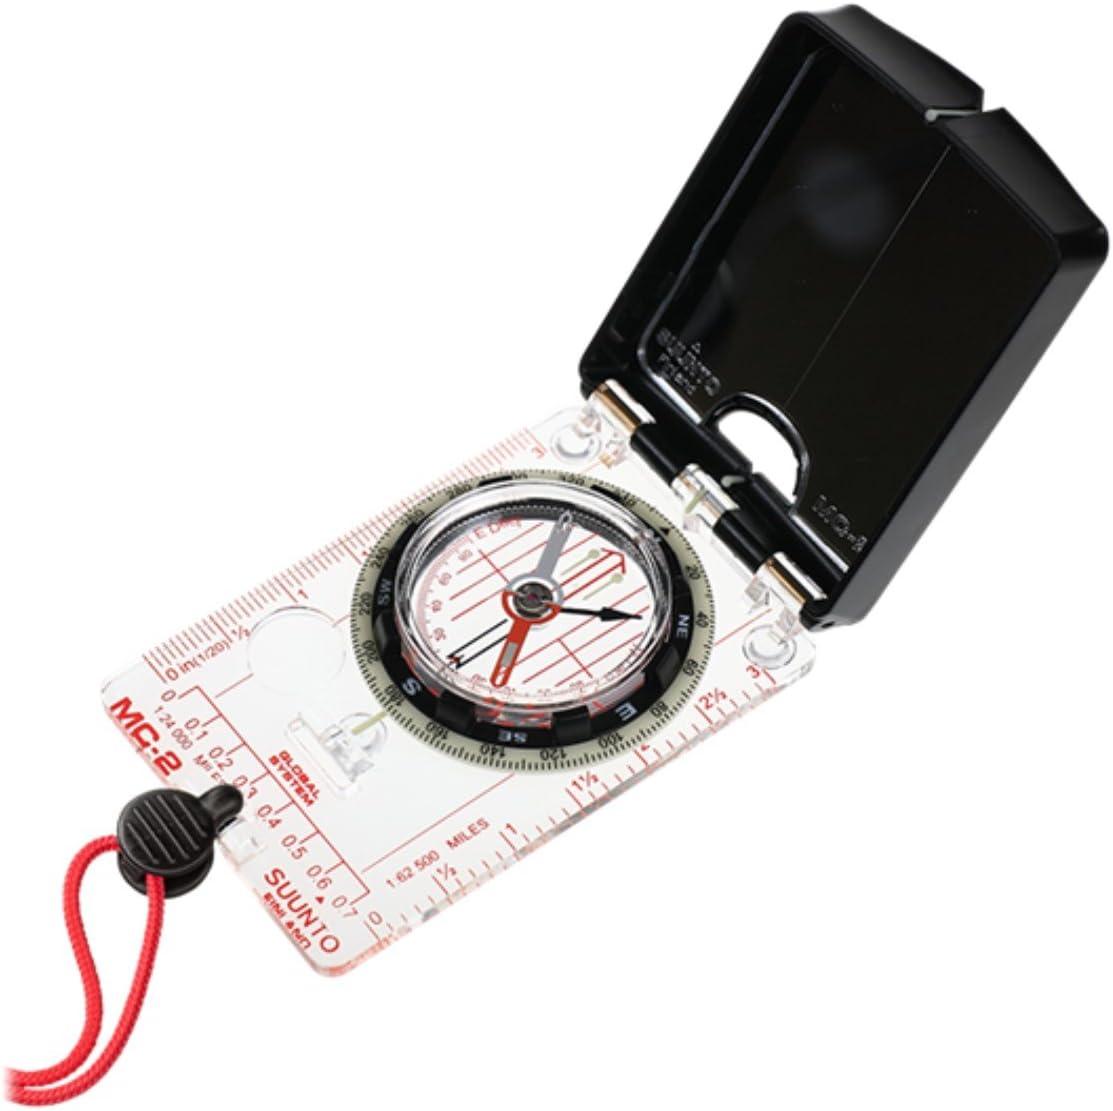 SUUNTO MC-2G Global Compass : Sport Compasses : Sports & Outdoors